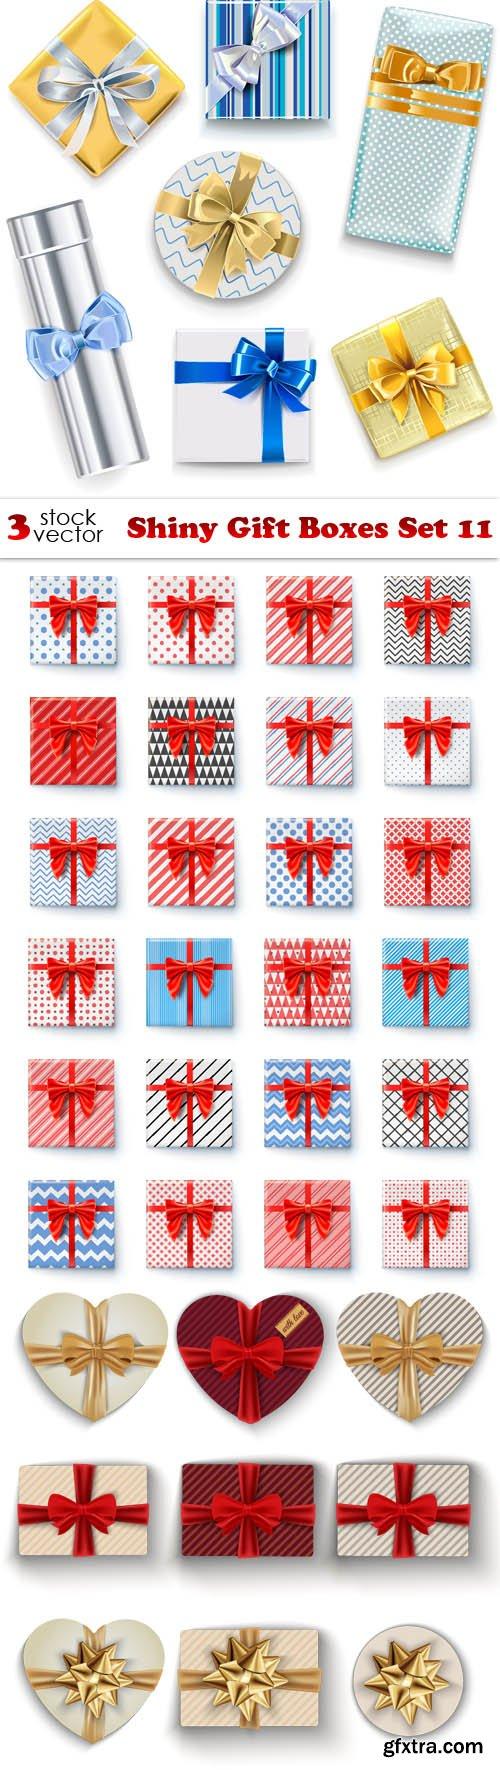 Vectors - Shiny Gift Boxes Set 11